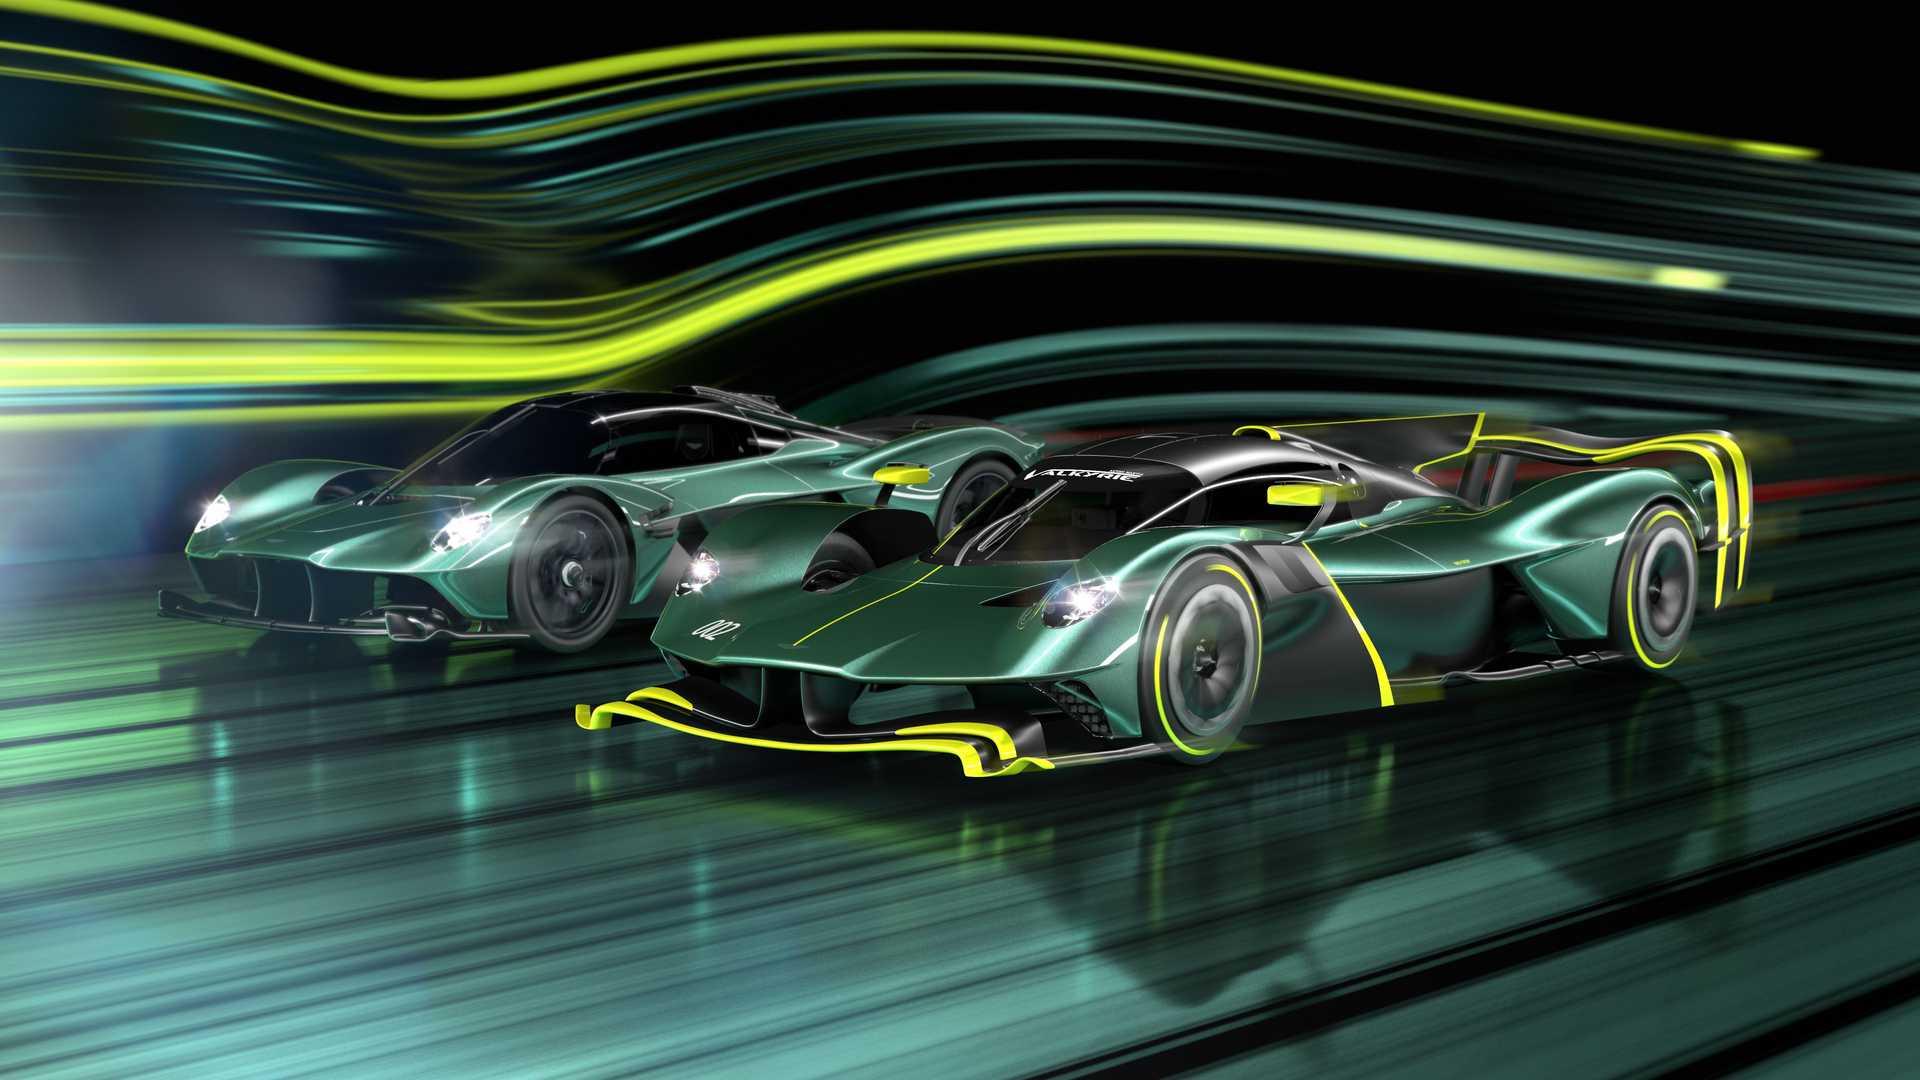 Nuevo Aston Martin Valkyrie AMR Pro 2021: más de 1.000 CV para un hipercoche de circuito